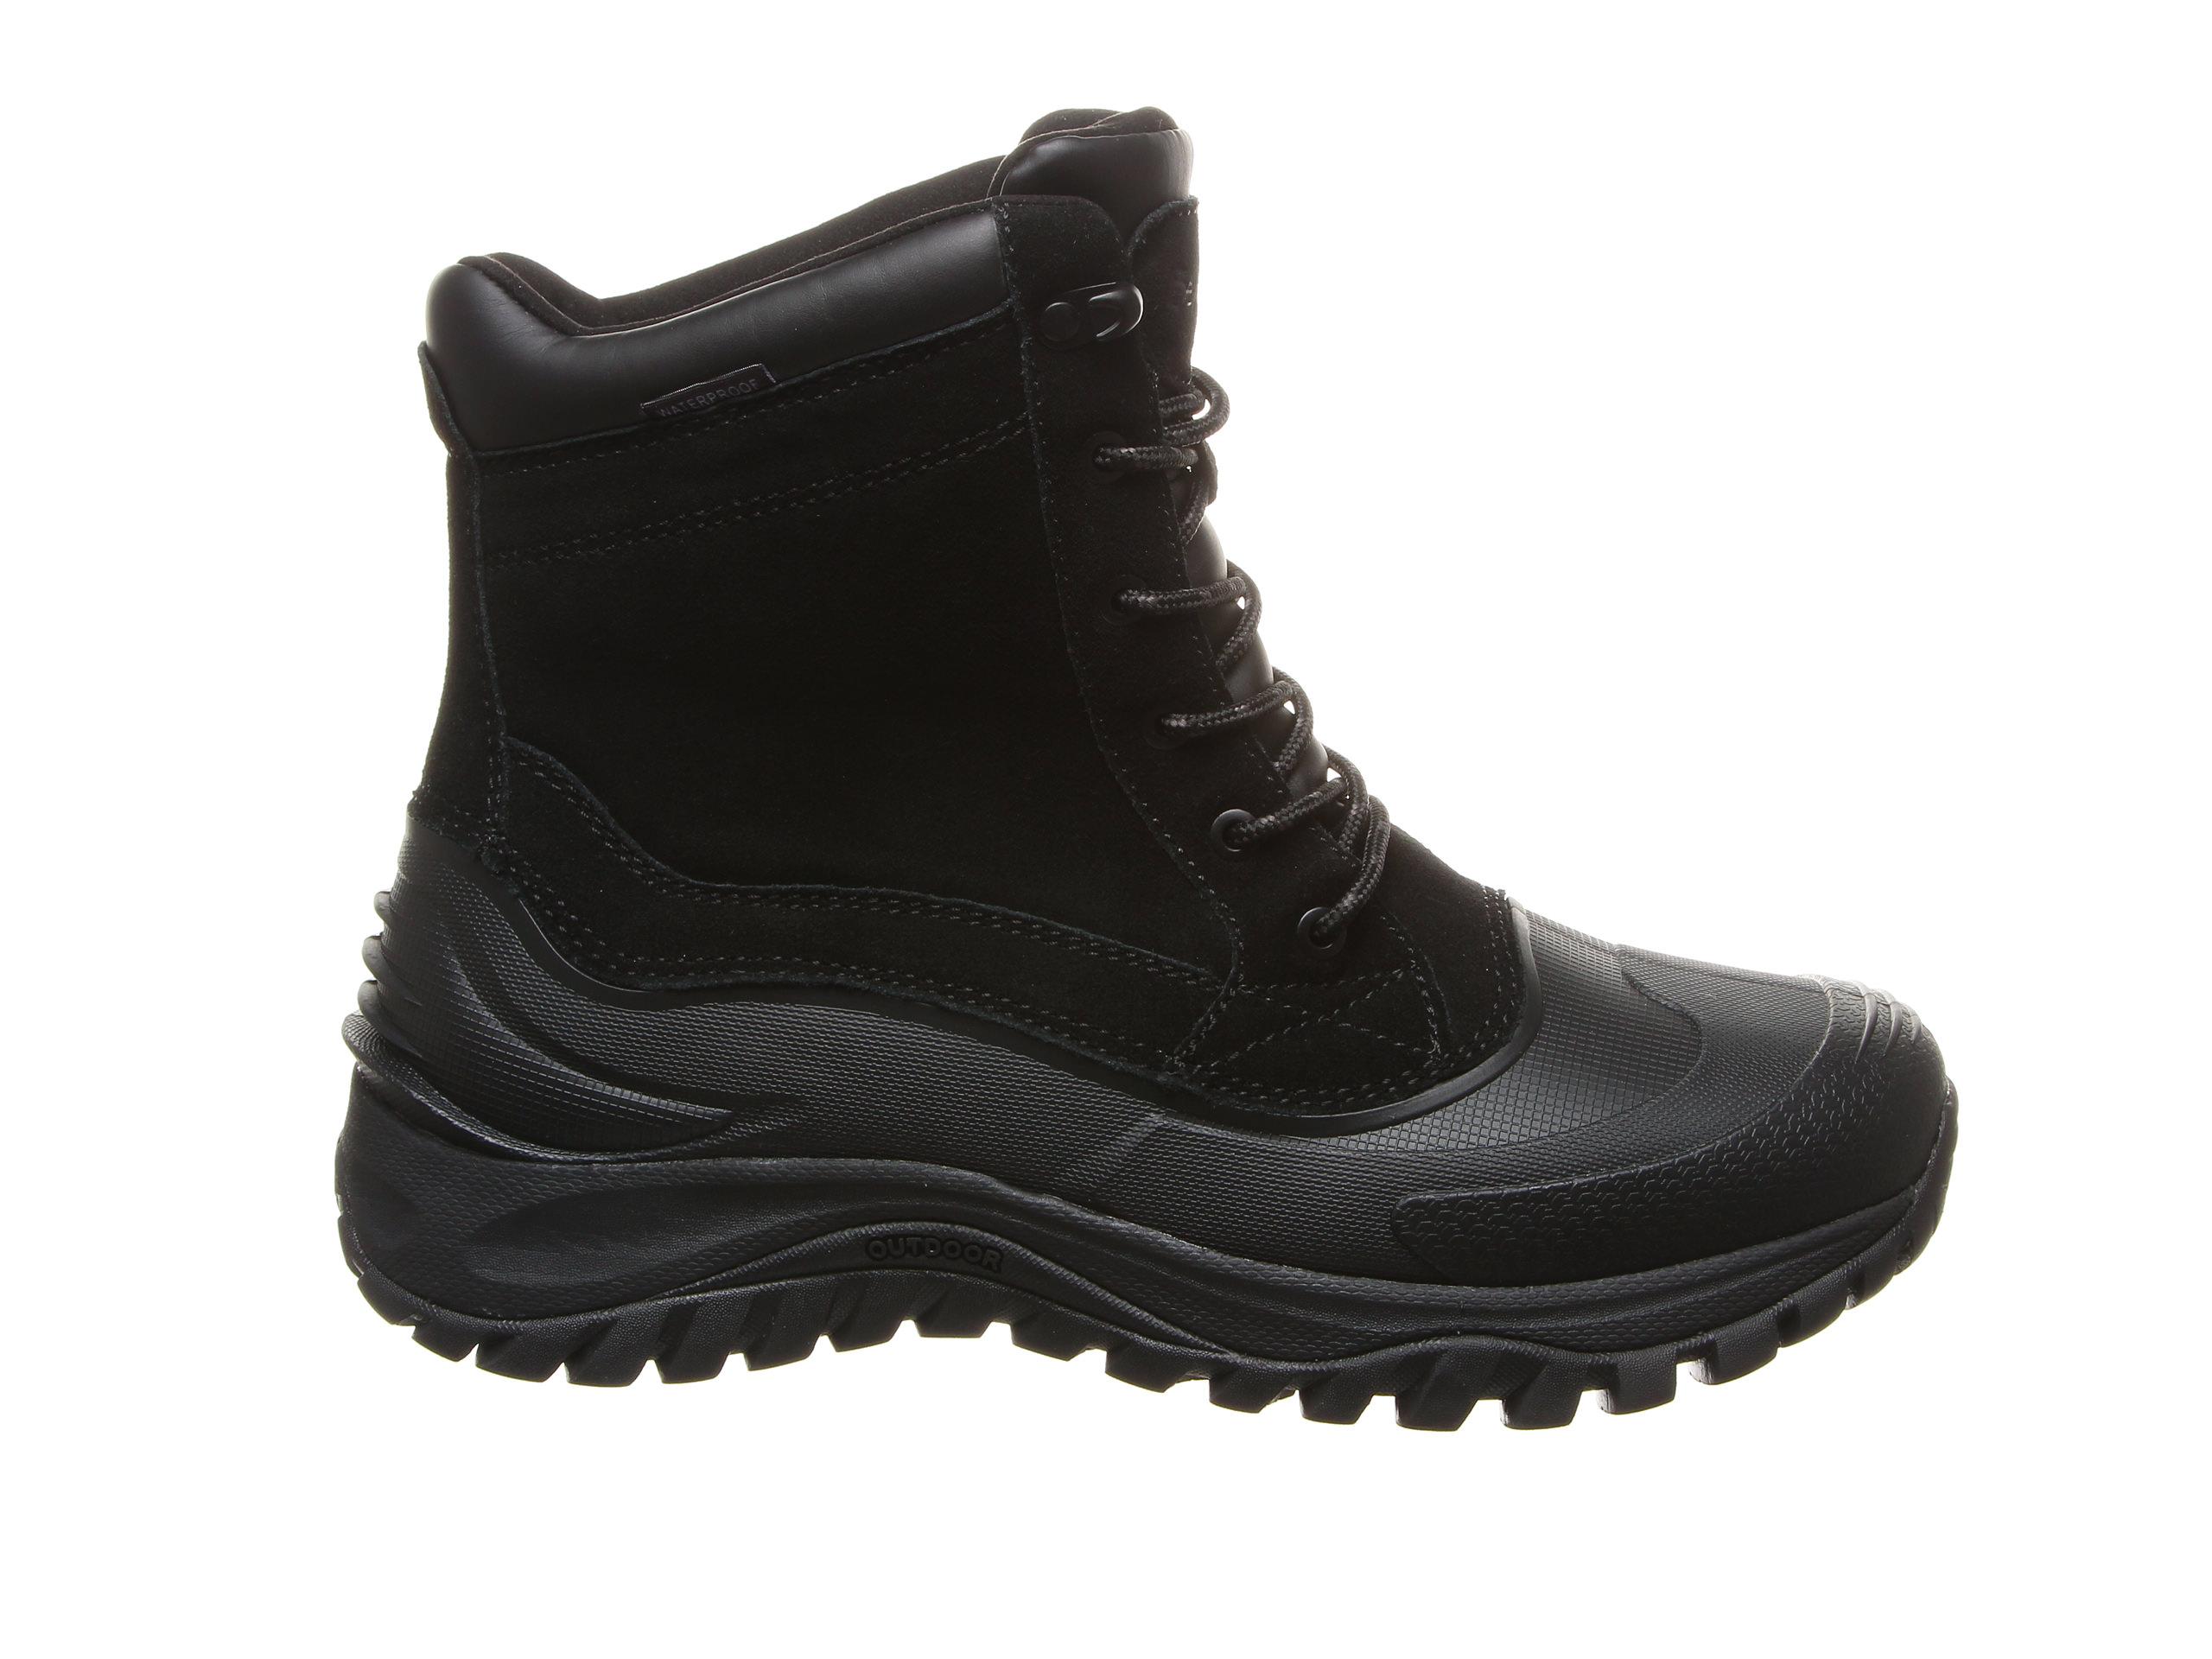 Bearpaw Teton Men's Boots (Black)